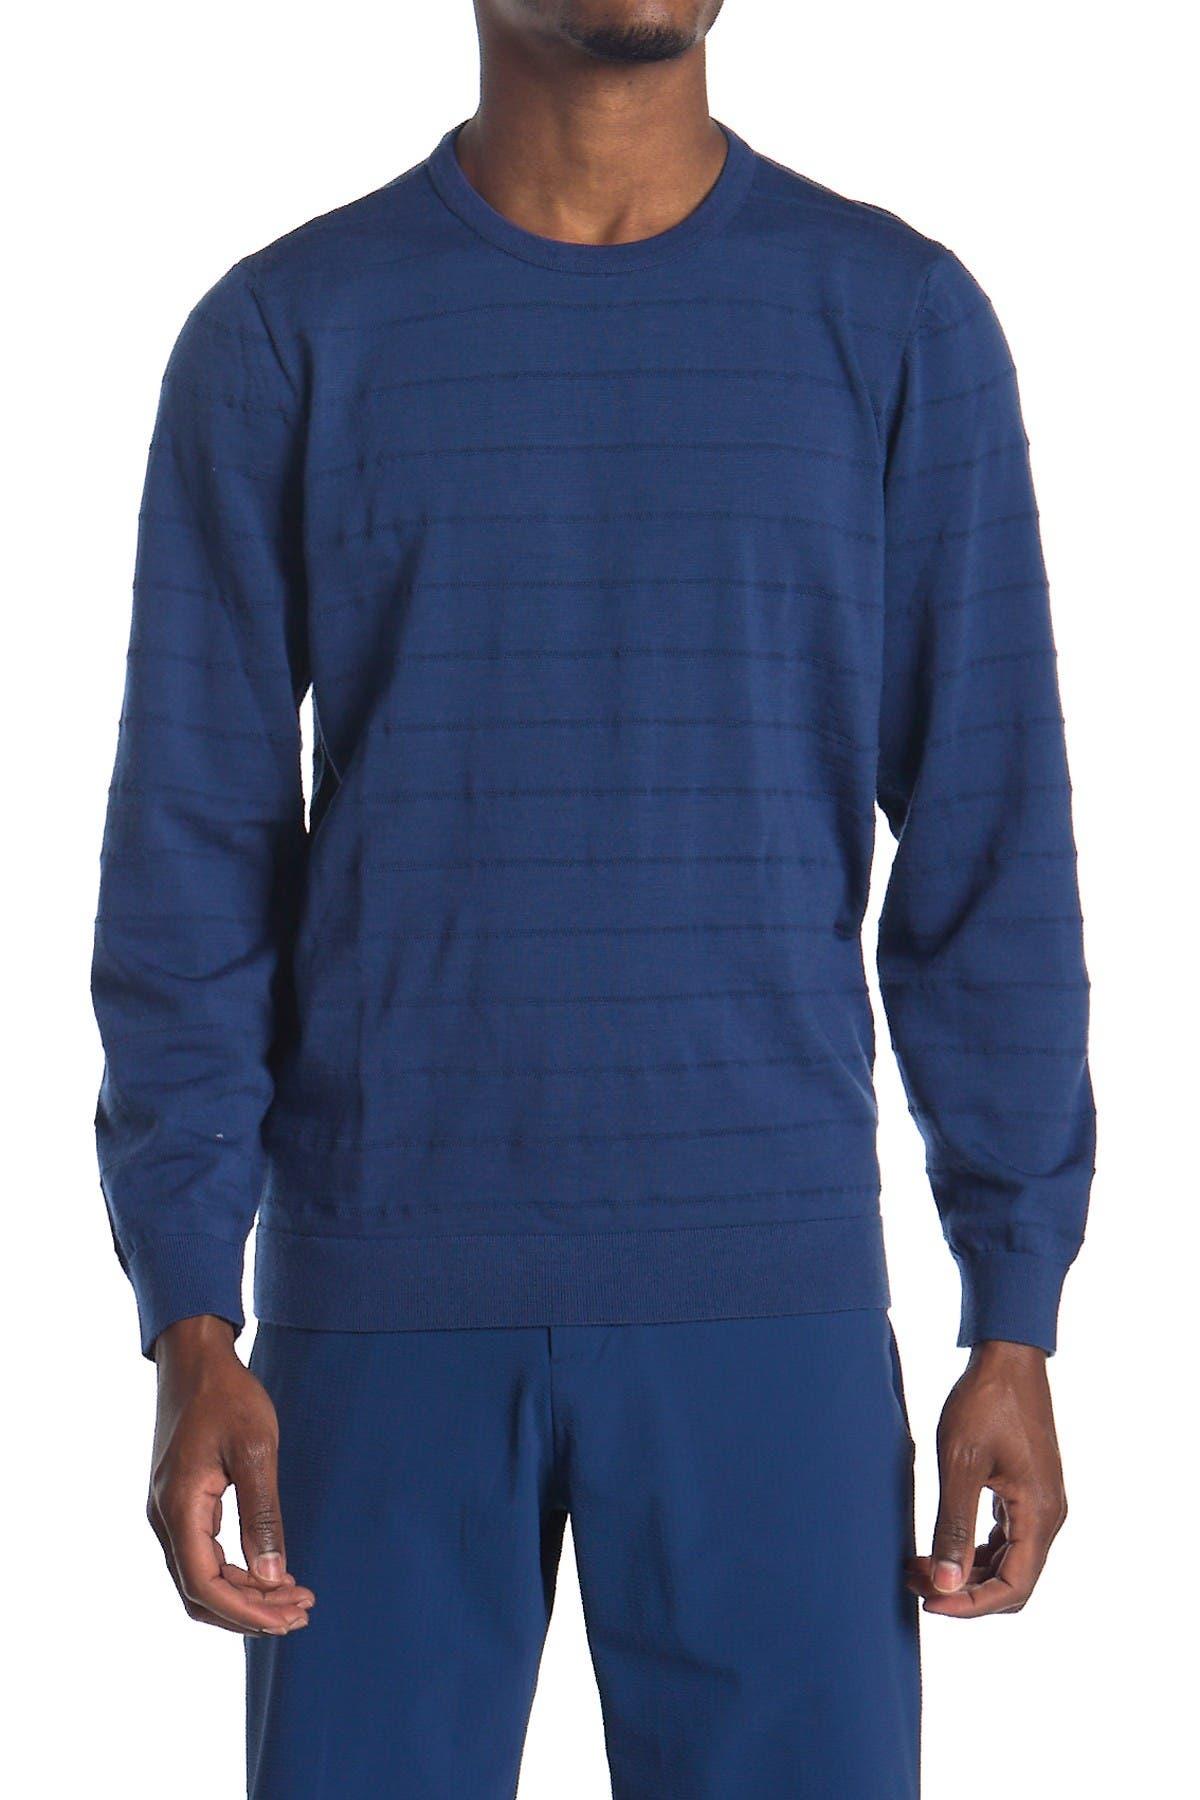 Image of adidas Printed Crewneck Wool Golf Sweater